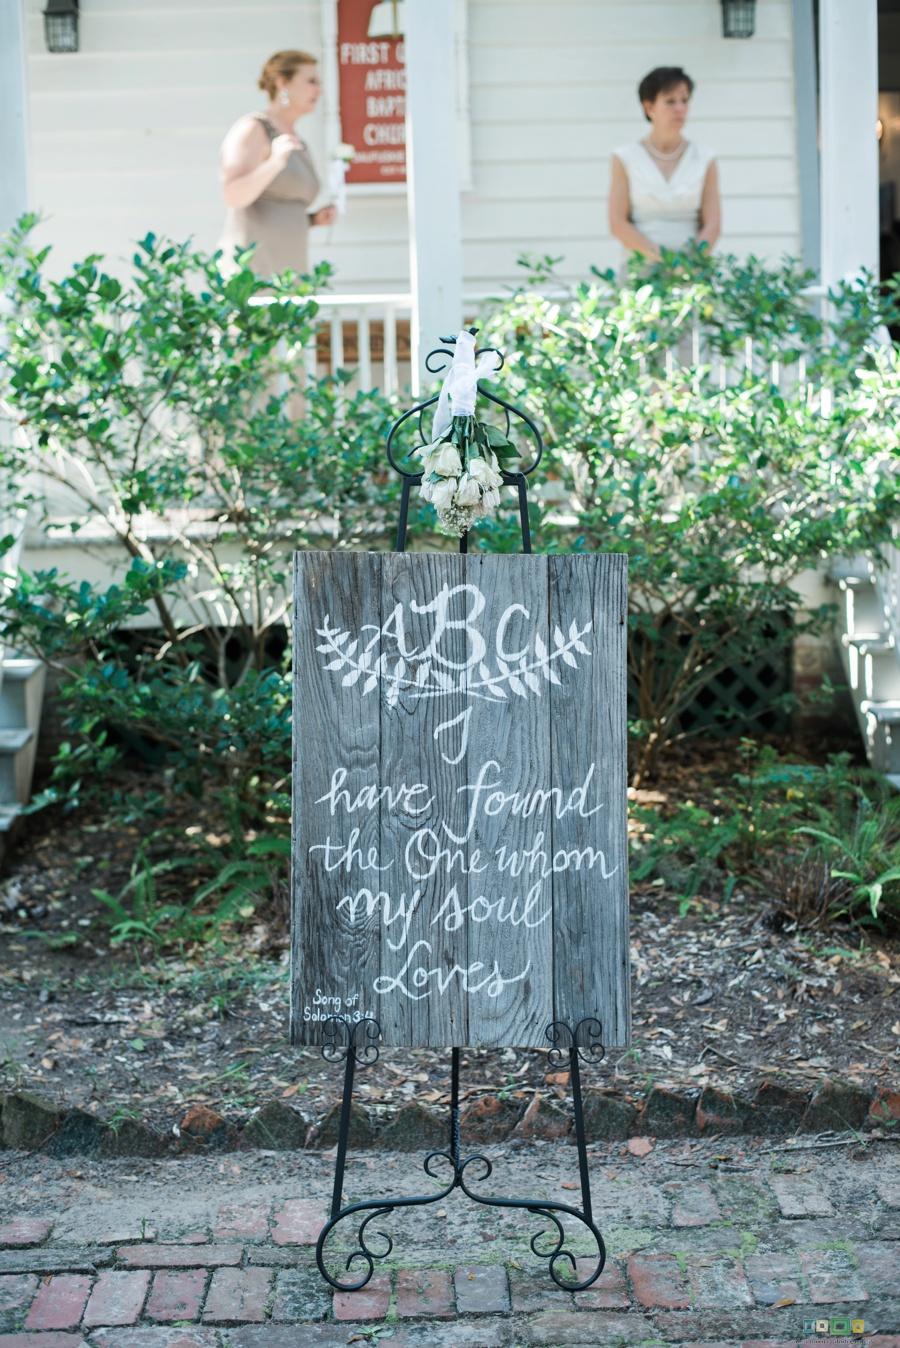 alea-moore-photography-Daufuskie-Island-wedding-ivory-and-beau-bridal-boutique-dakota-nicole-miller-rebecca-schoneveld-marisol-classic-southern-wedding-savannah-wedding-dresses-savannah-bridal-boutique-savannah-weddings-savannah-bridal-gowns-16.jpg